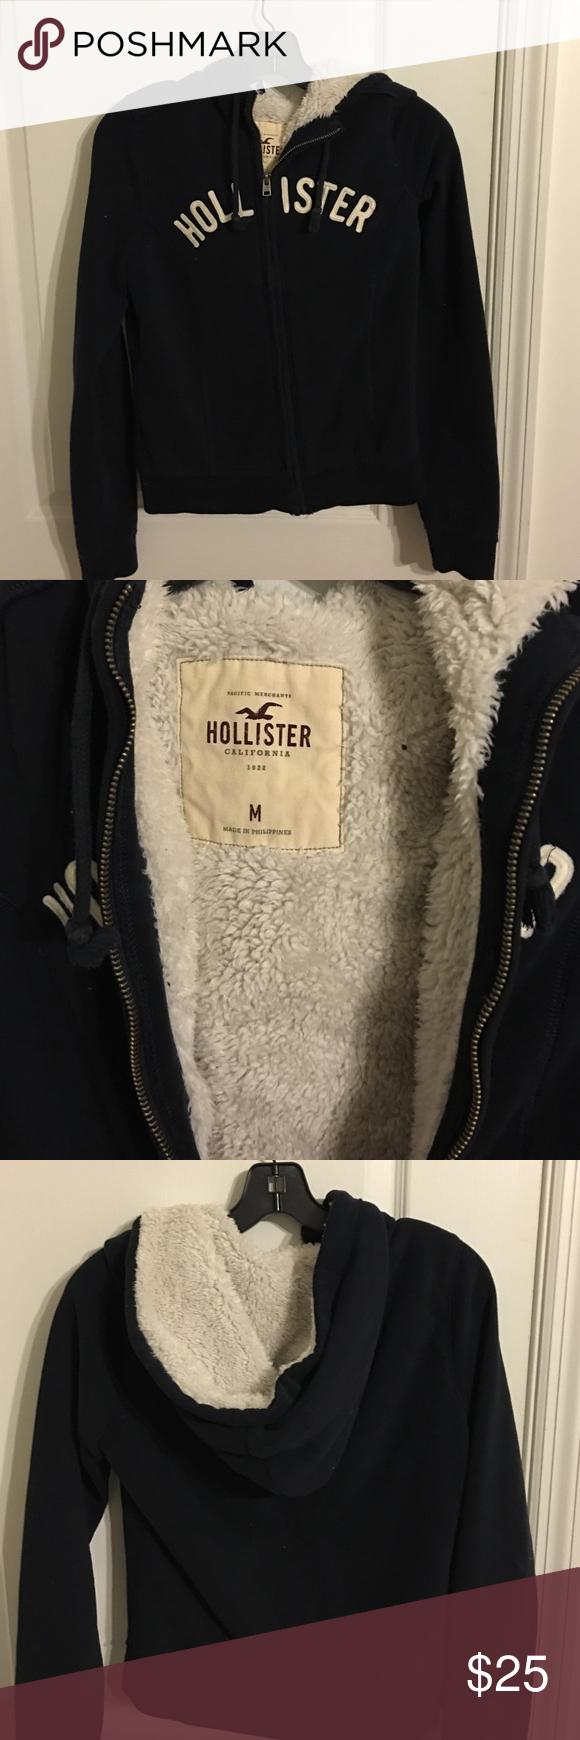 hollister zip up jacket super soft and comfy! never worn looks brand new Hollister Tops Sweatshirts & Hoodies